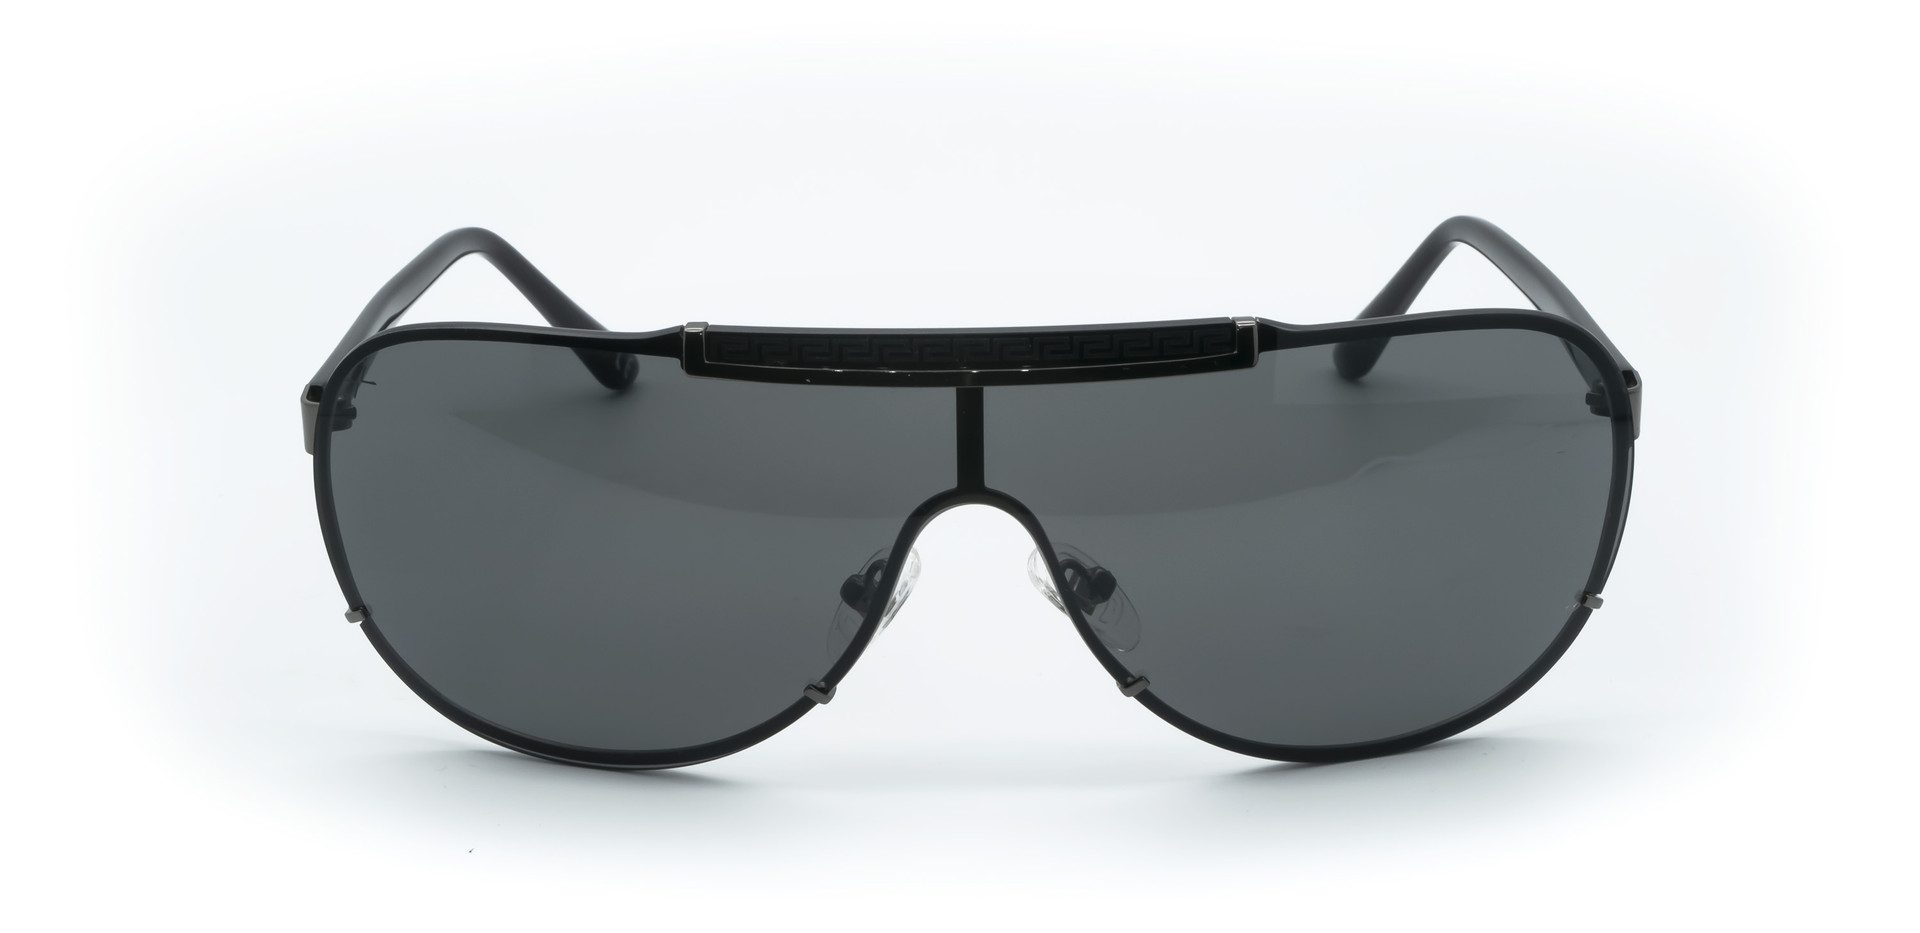 BlackEyewear_ModelL111Col05_Front.jpg